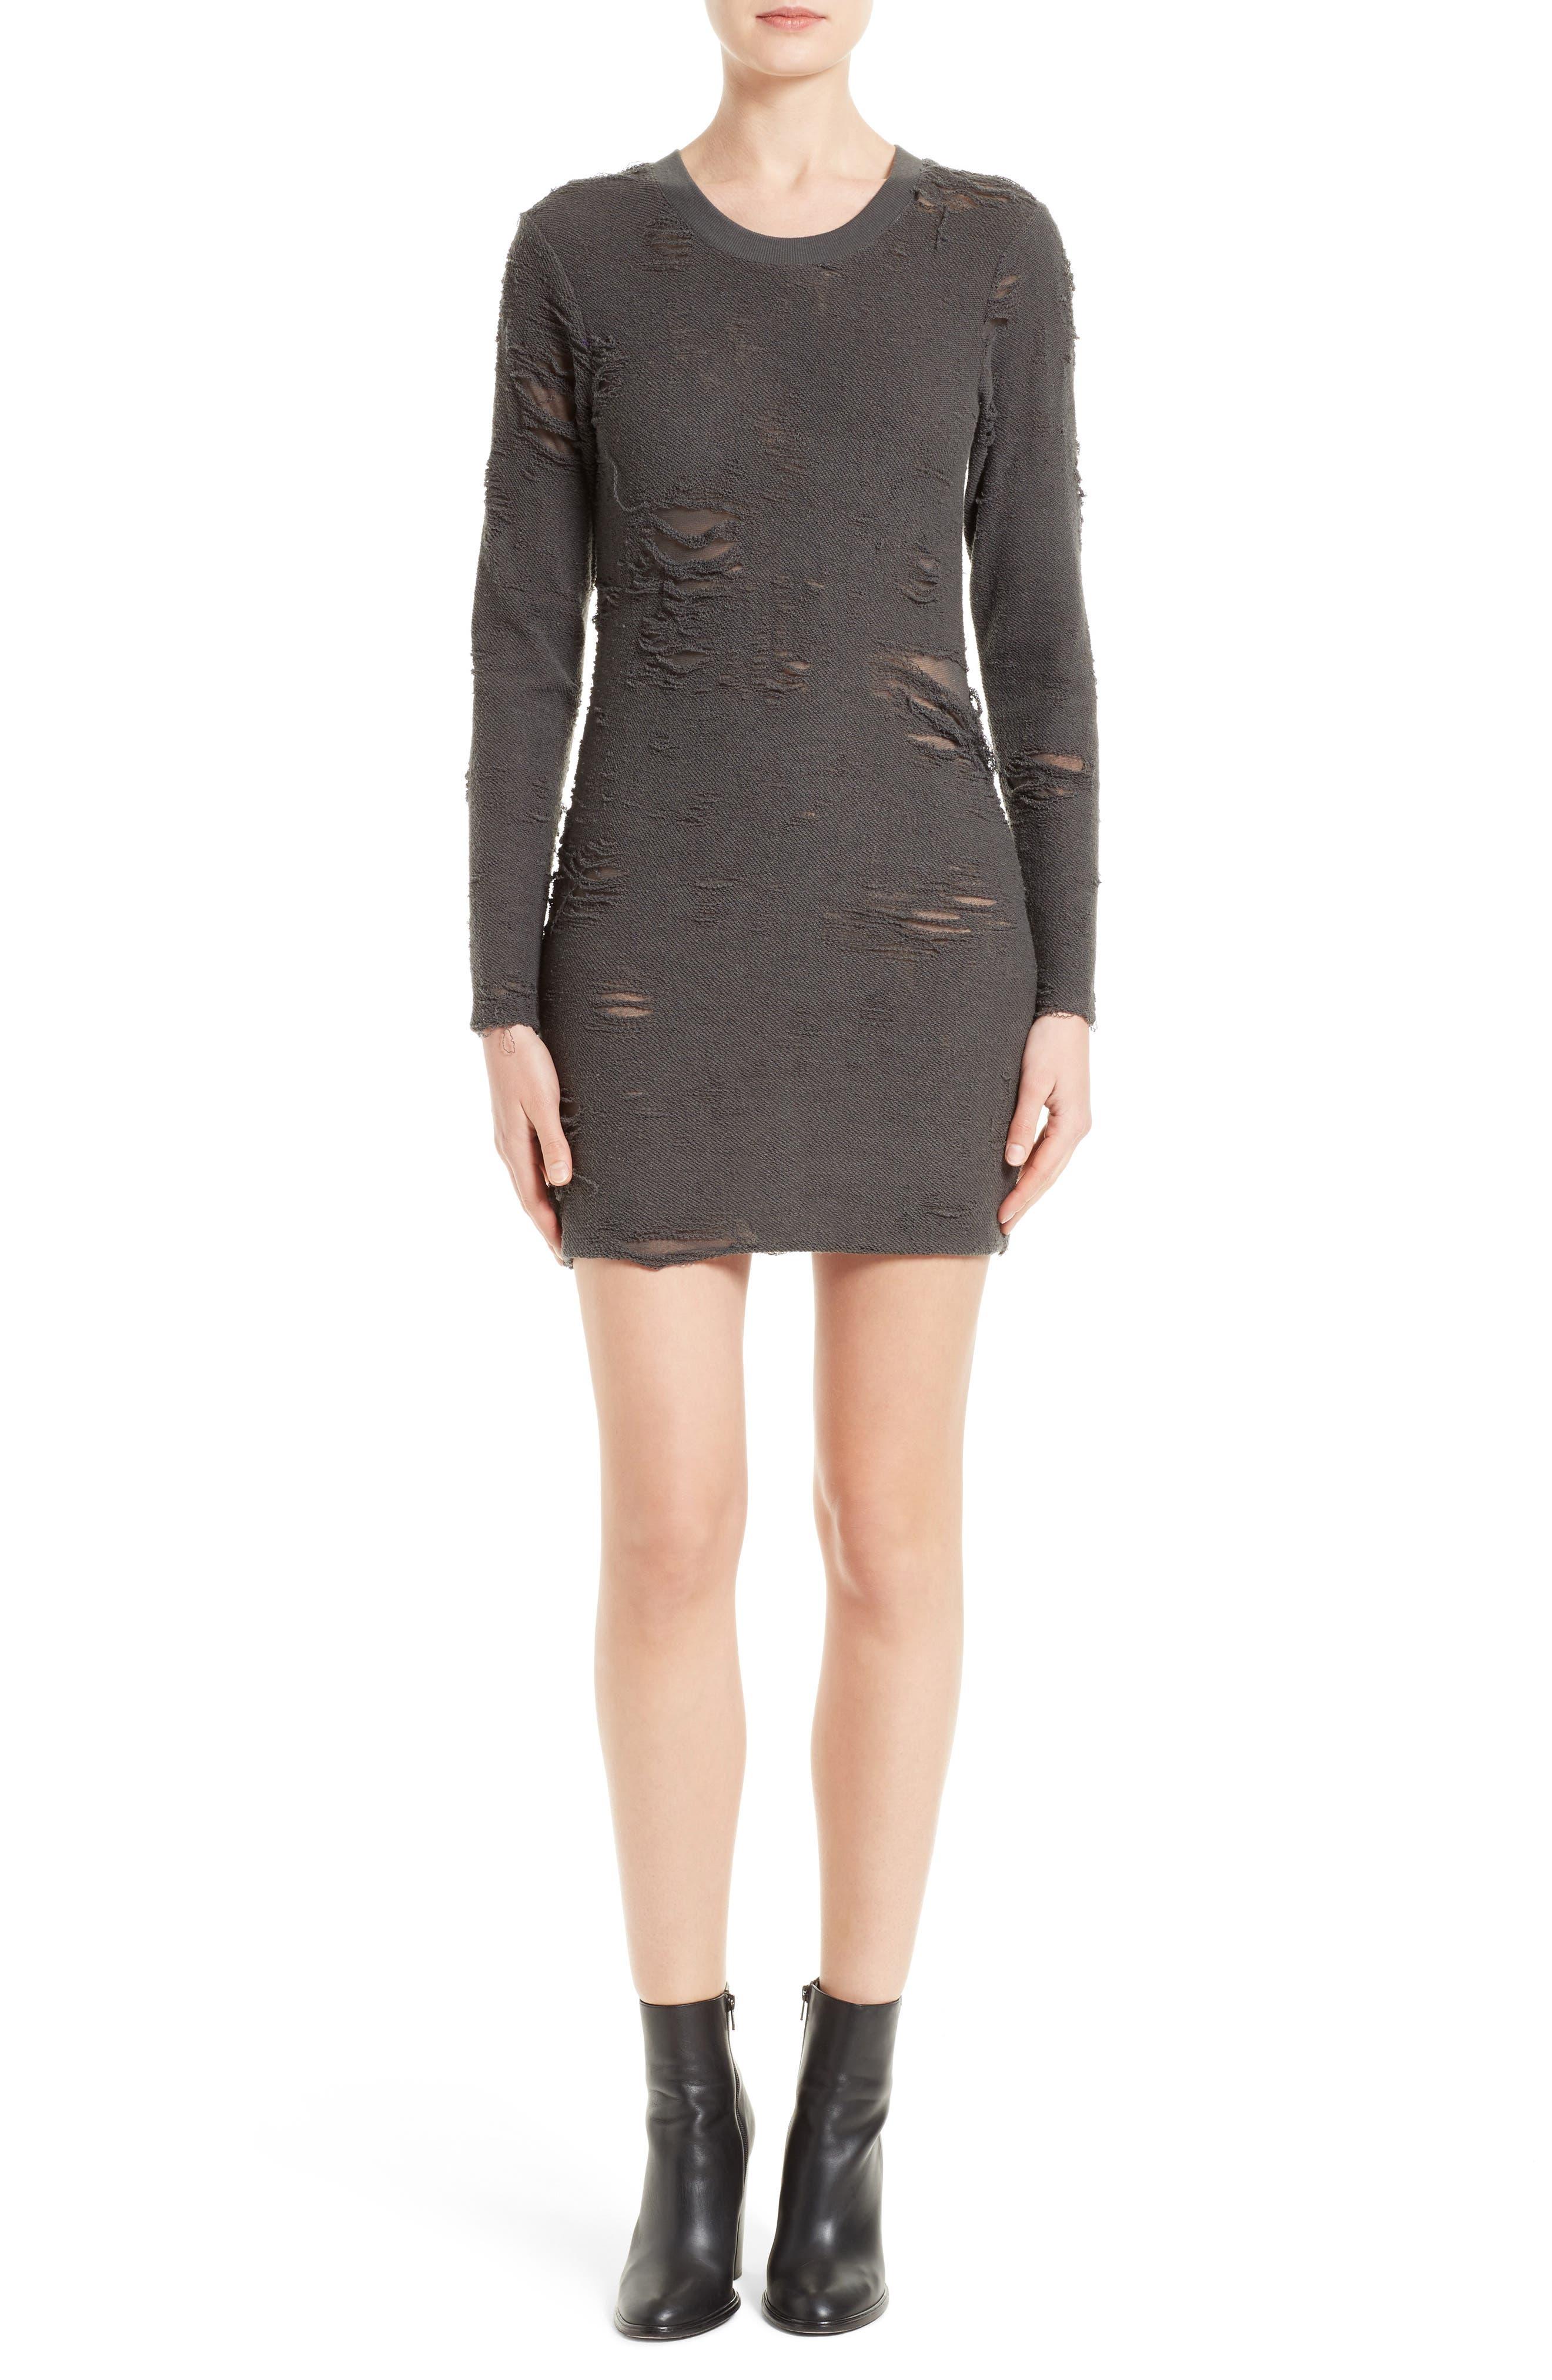 Main Image - IRO Cevoc Distressed Dress